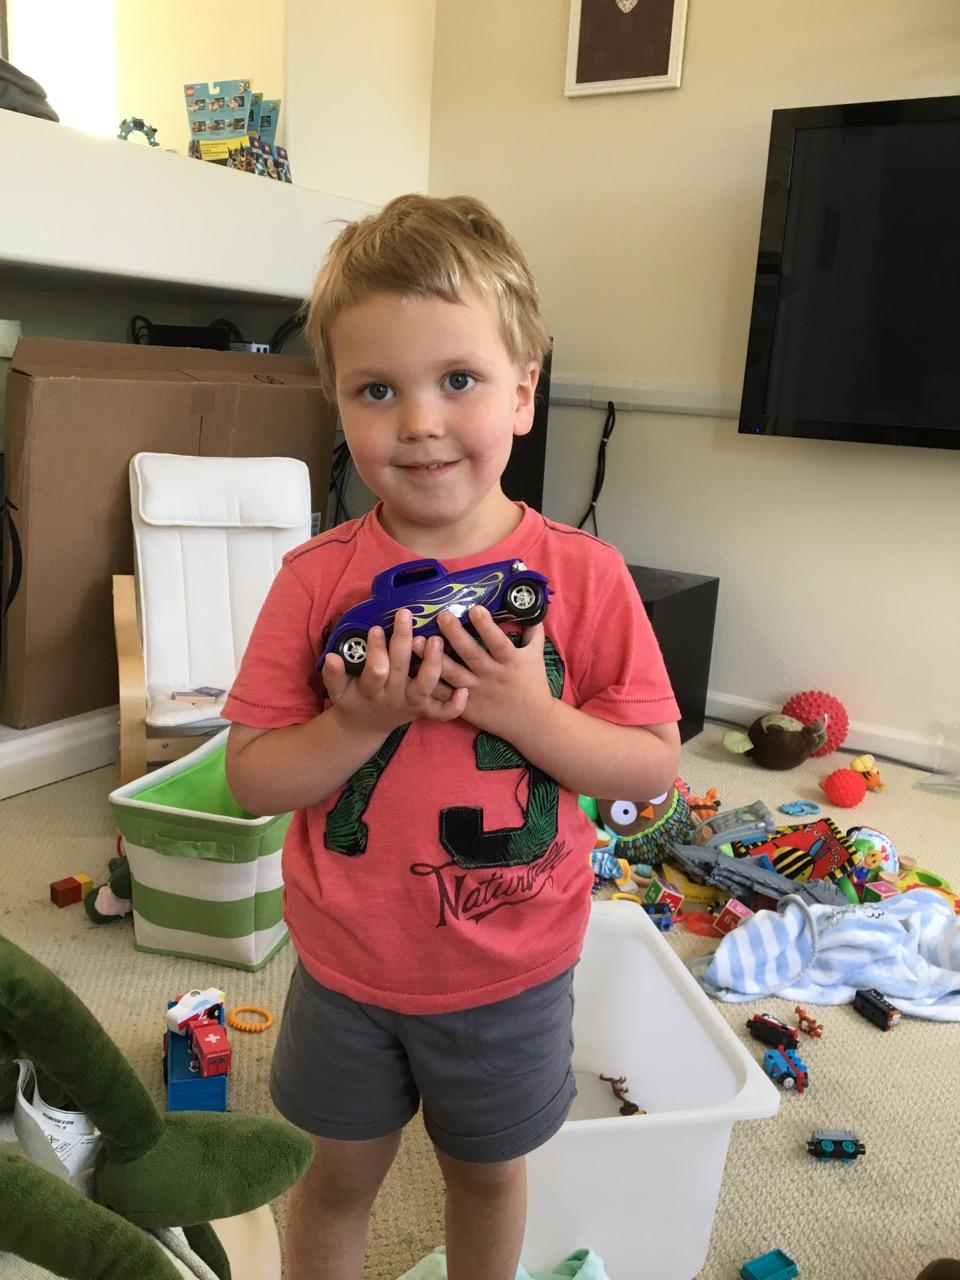 Showing off his model car (June)